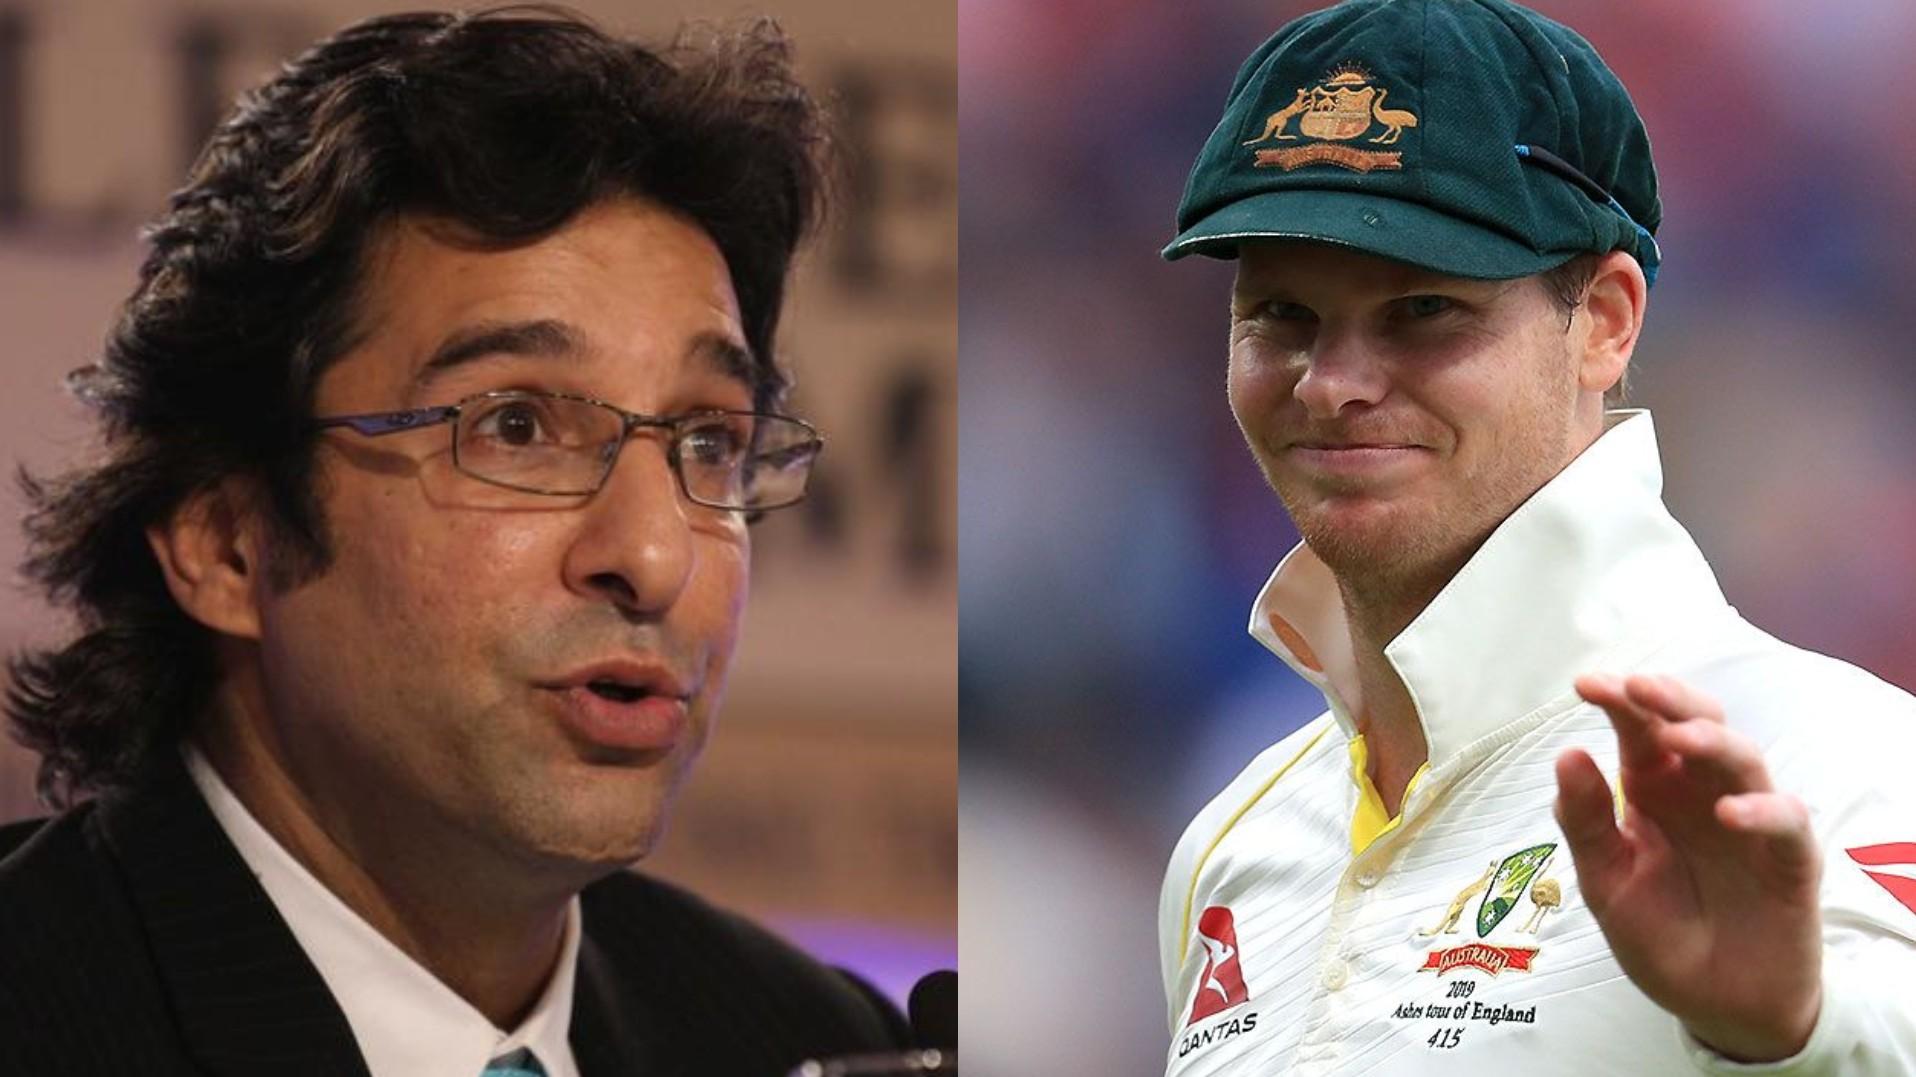 AUS v PAK 2019: Wasim Akram advises Pakistan bowlers to not follow Steve Smith's stance